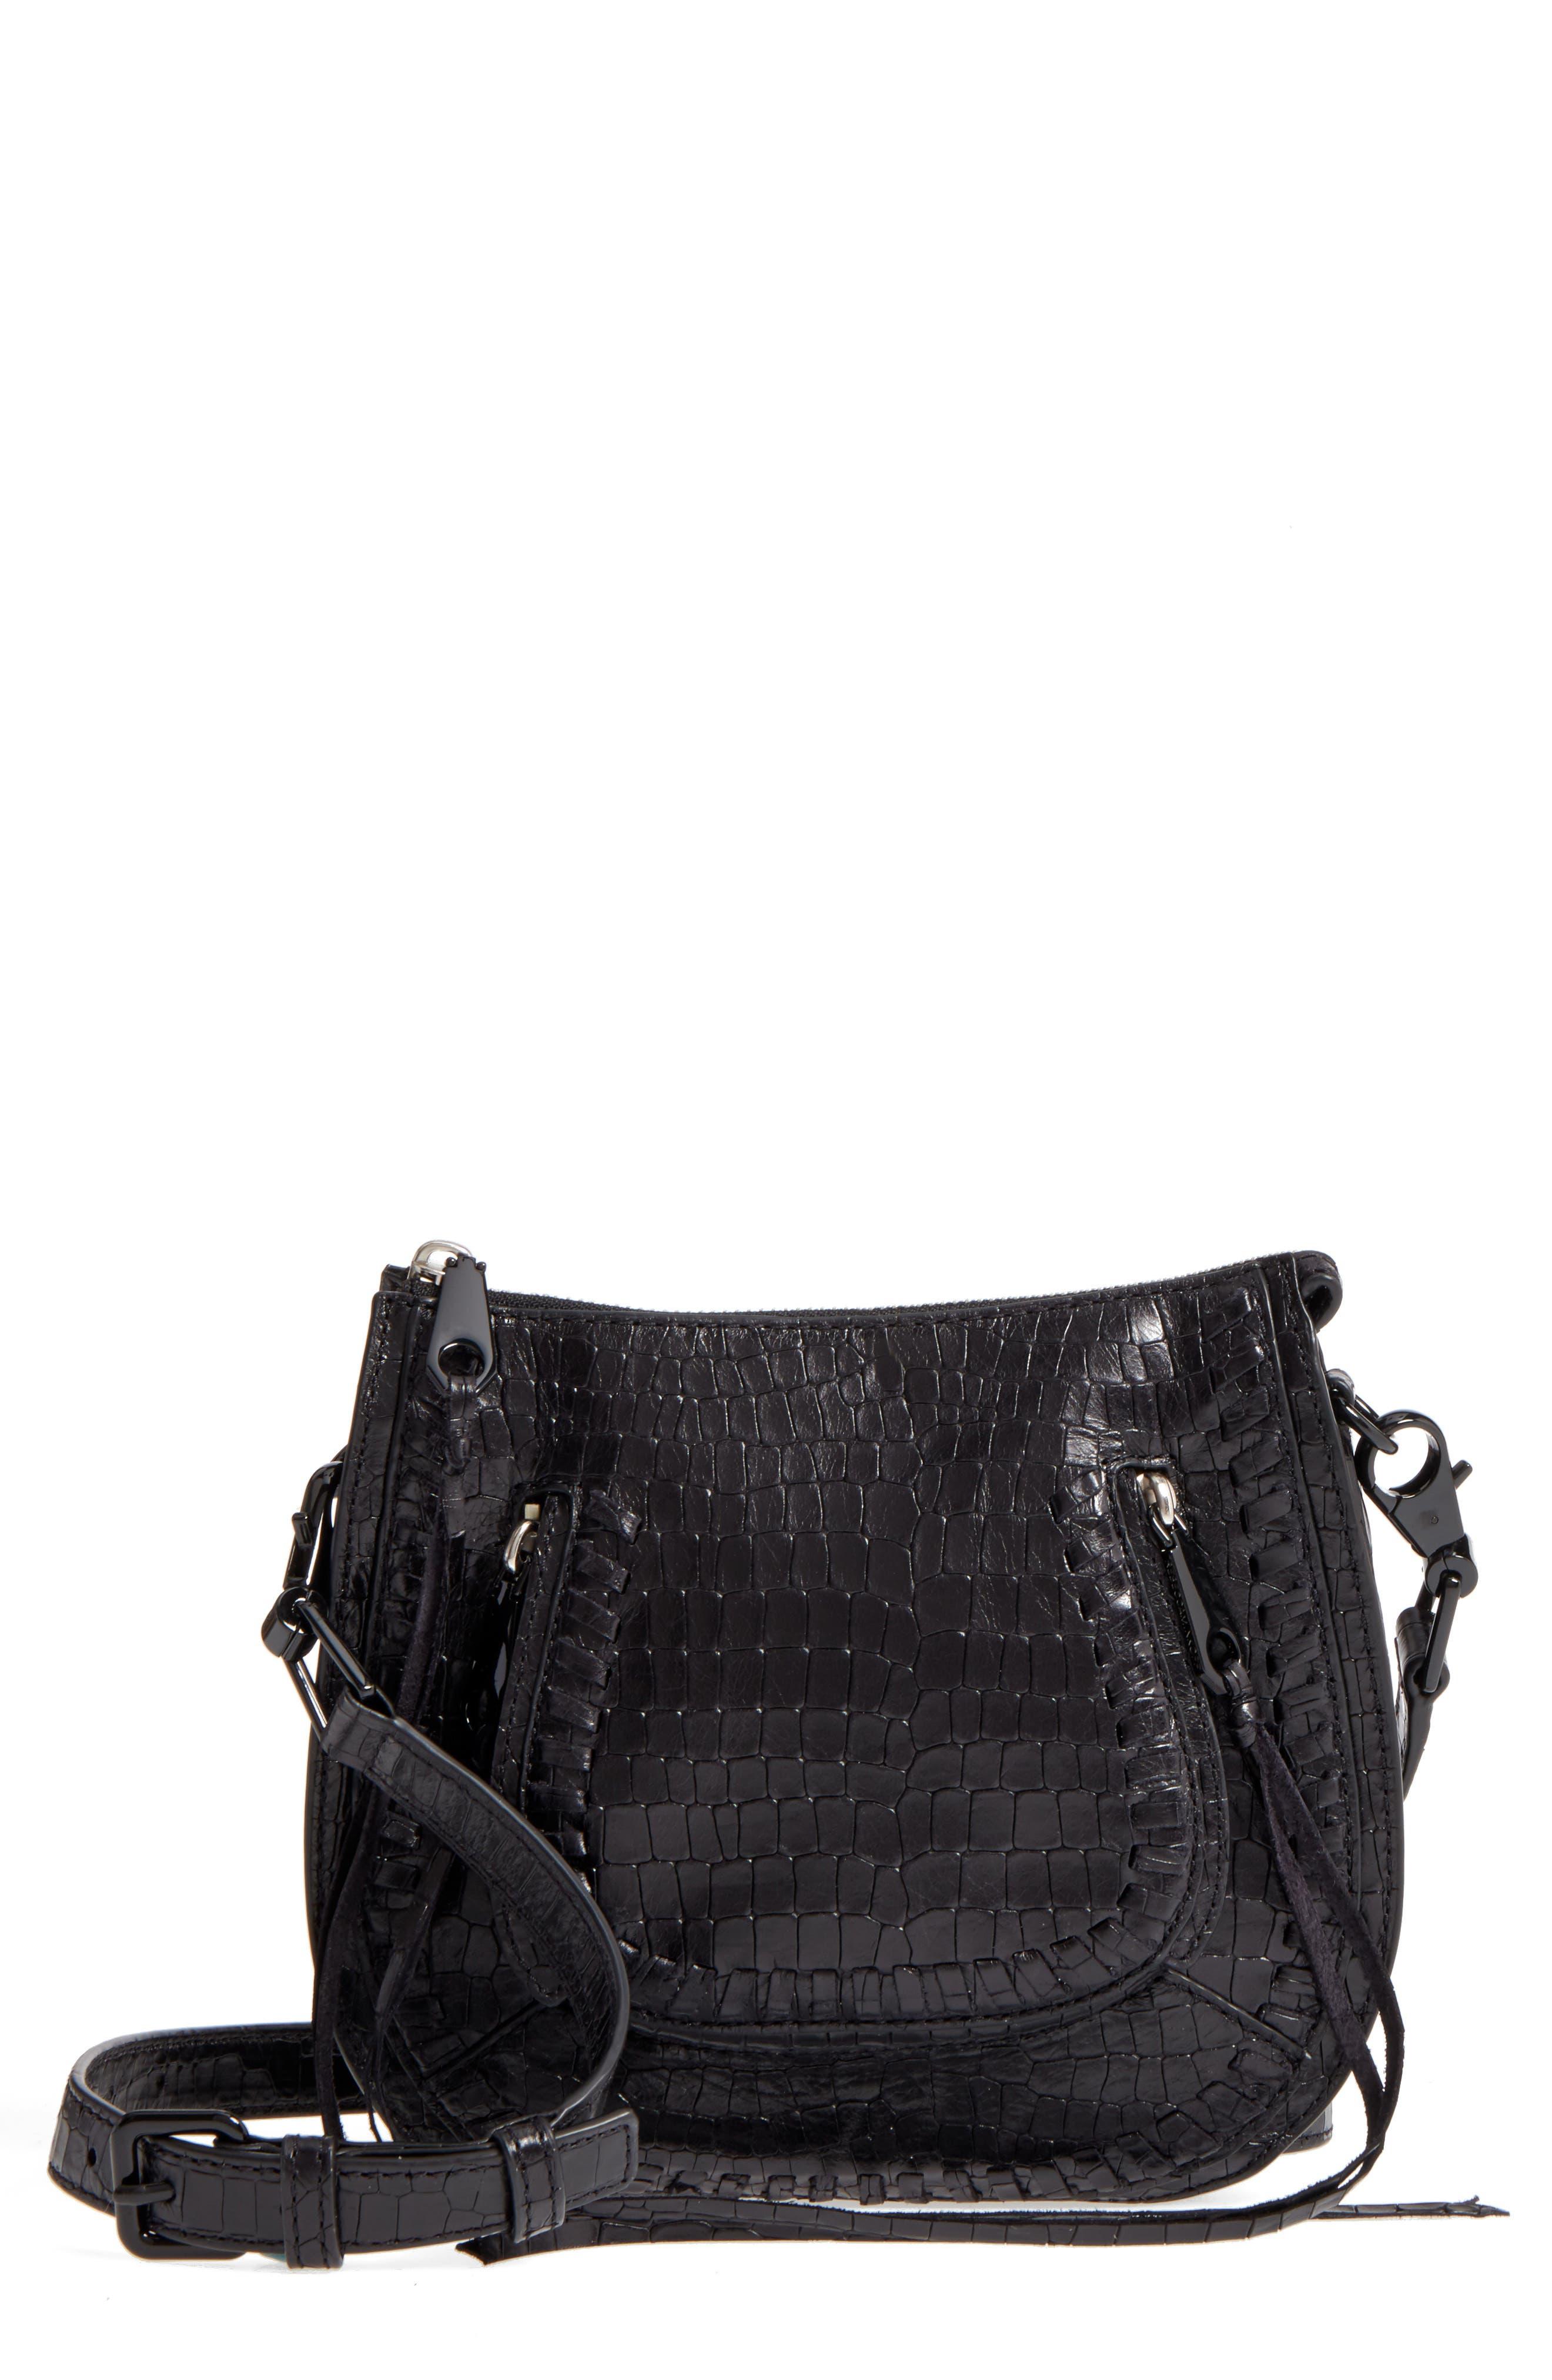 Alternate Image 1 Selected - Rebecca Minkoff Vanity Croc-Embossed Leather Saddle Bag